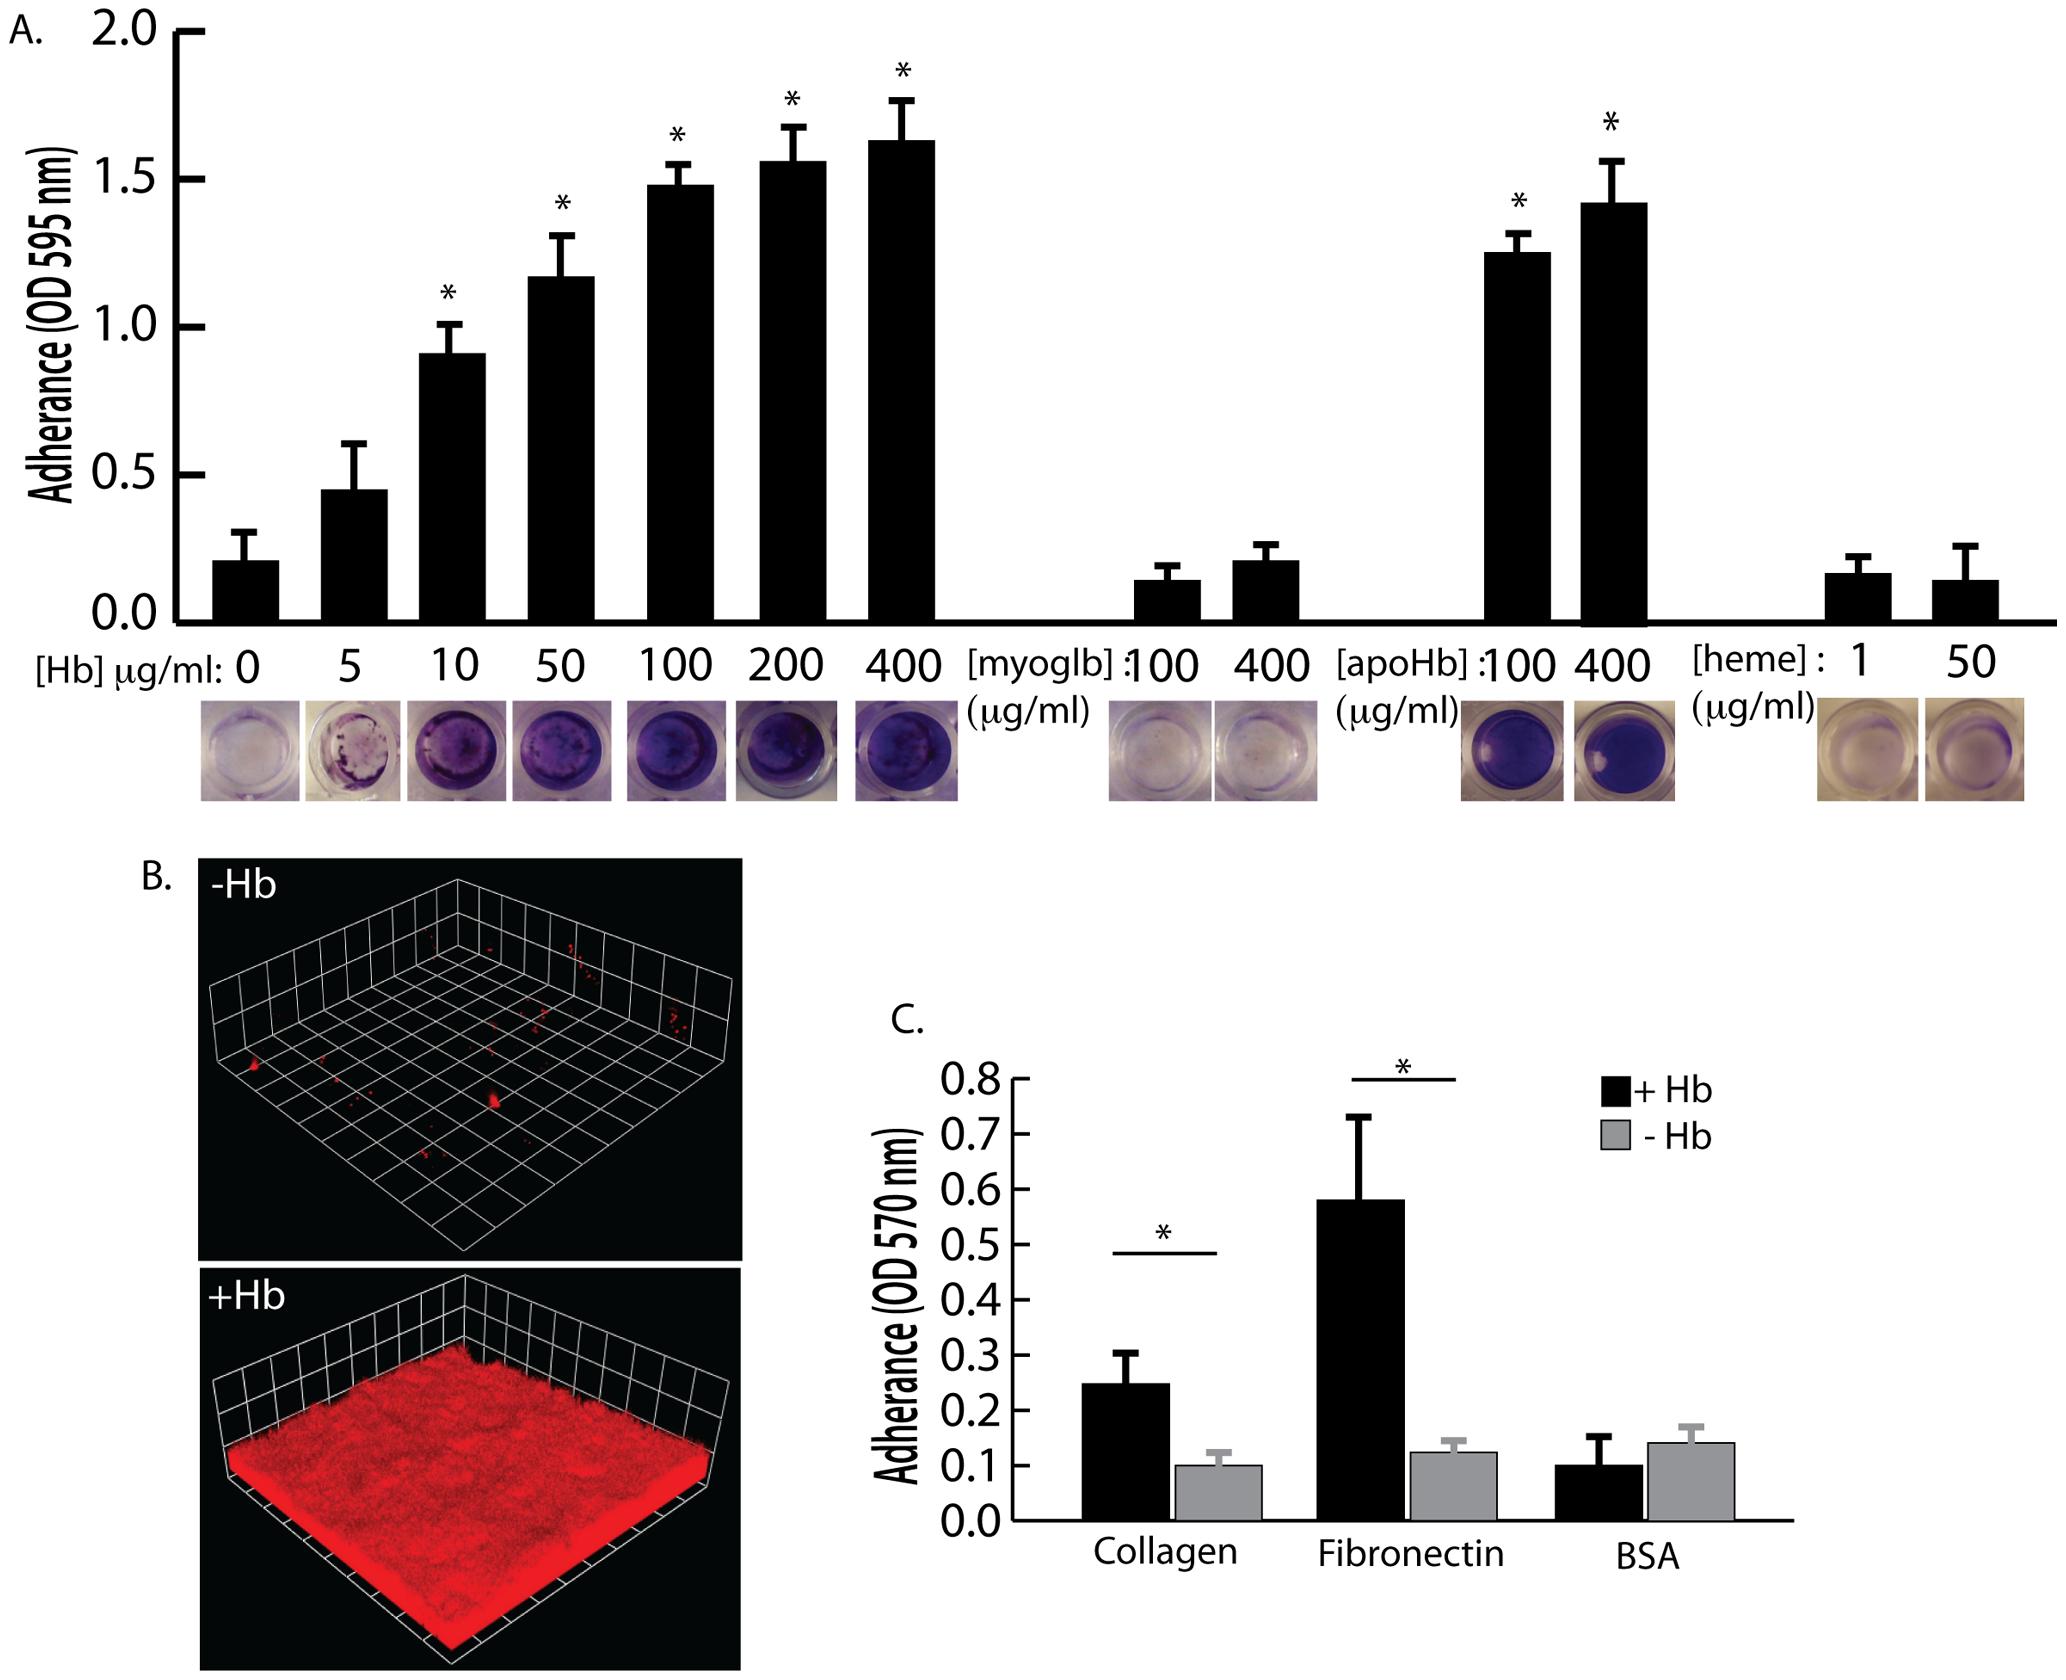 The effect of hemoglobin on <i>S. aureus</i> surface colonization.